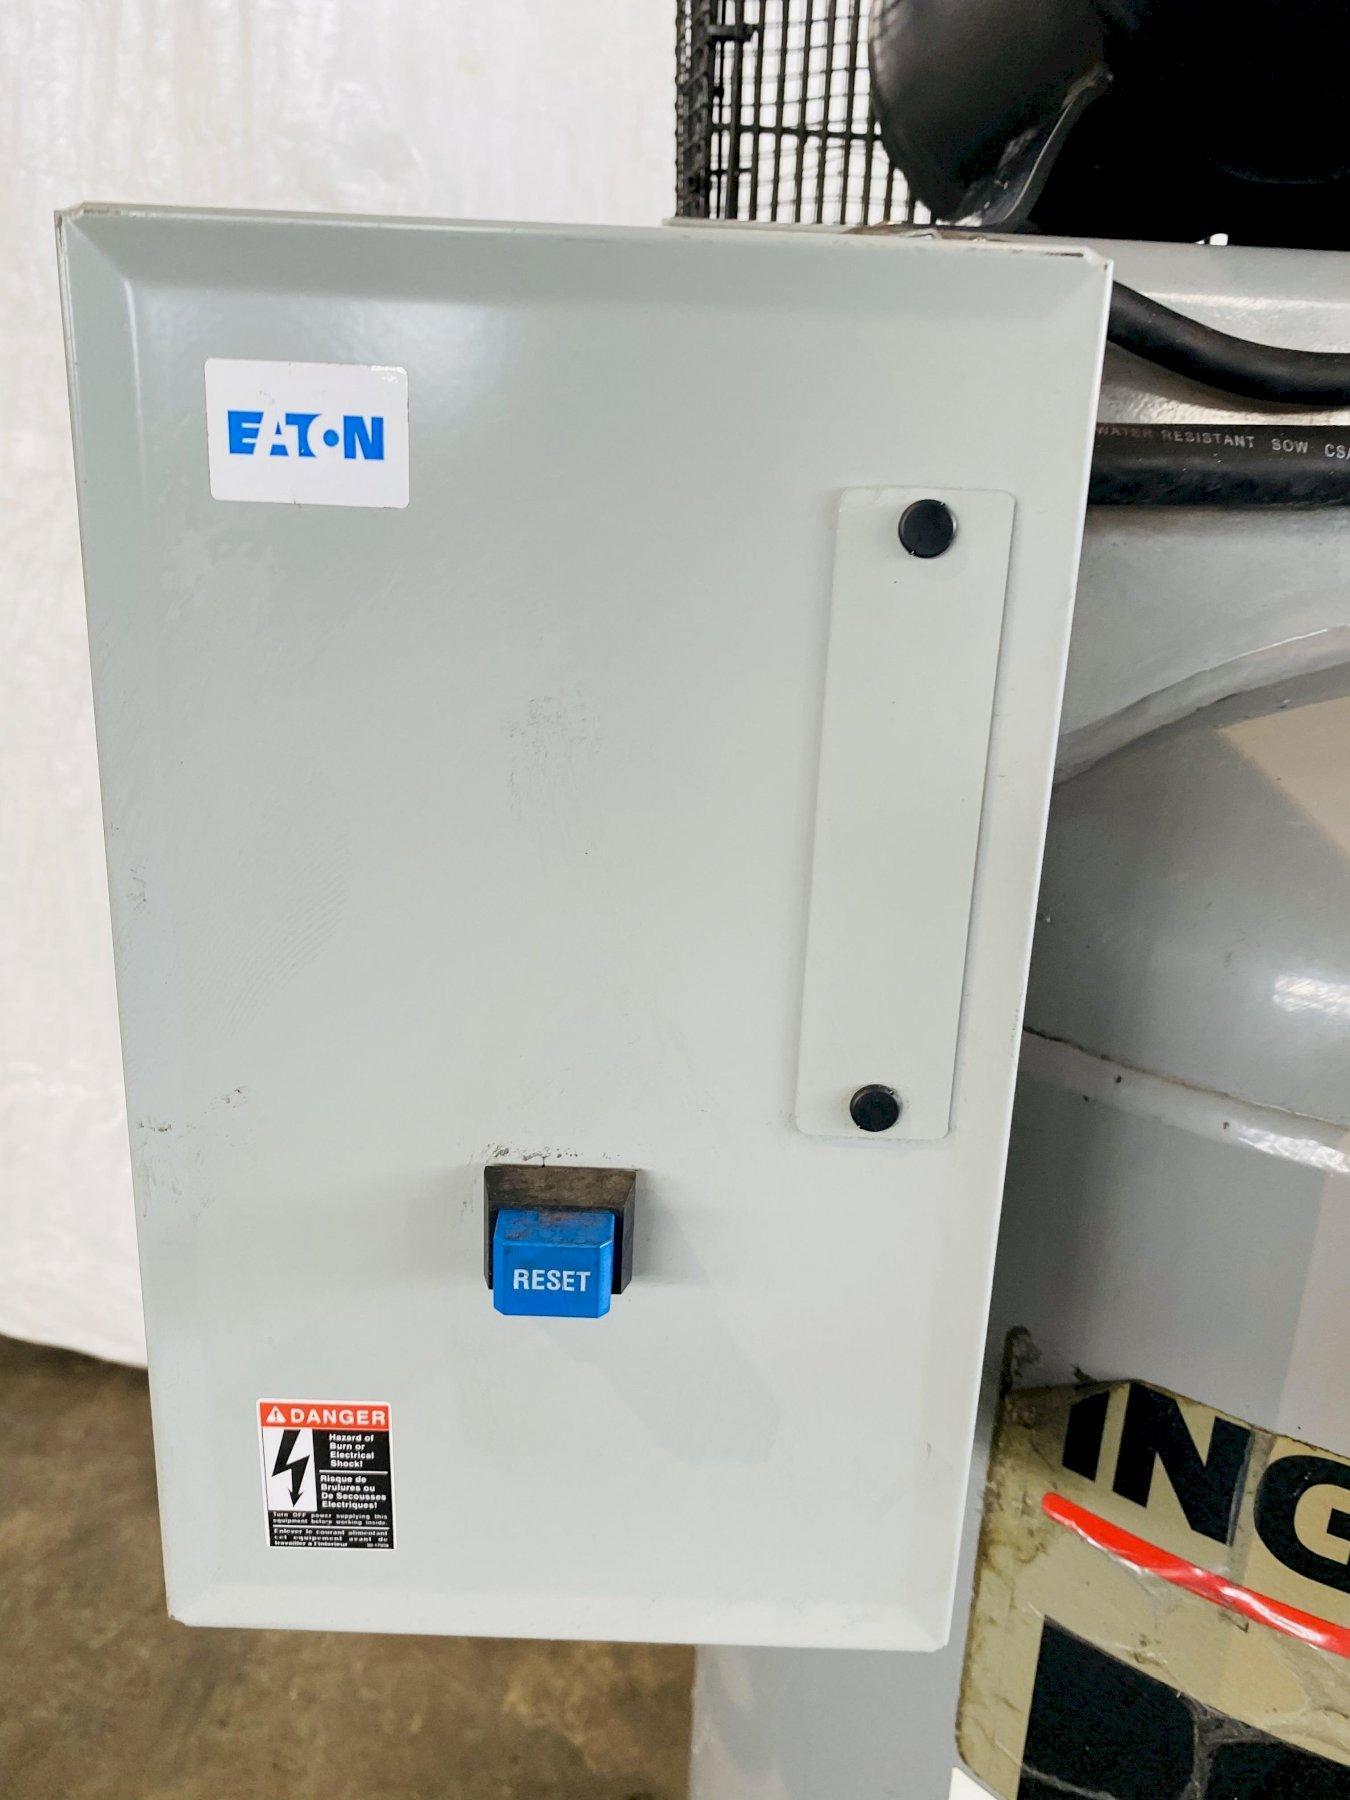 7-1/2 HP INGERSOLL-RAND 30T VERTICAL PISTON TYPE AIR COMPRESSOR. STOCK # 0631421